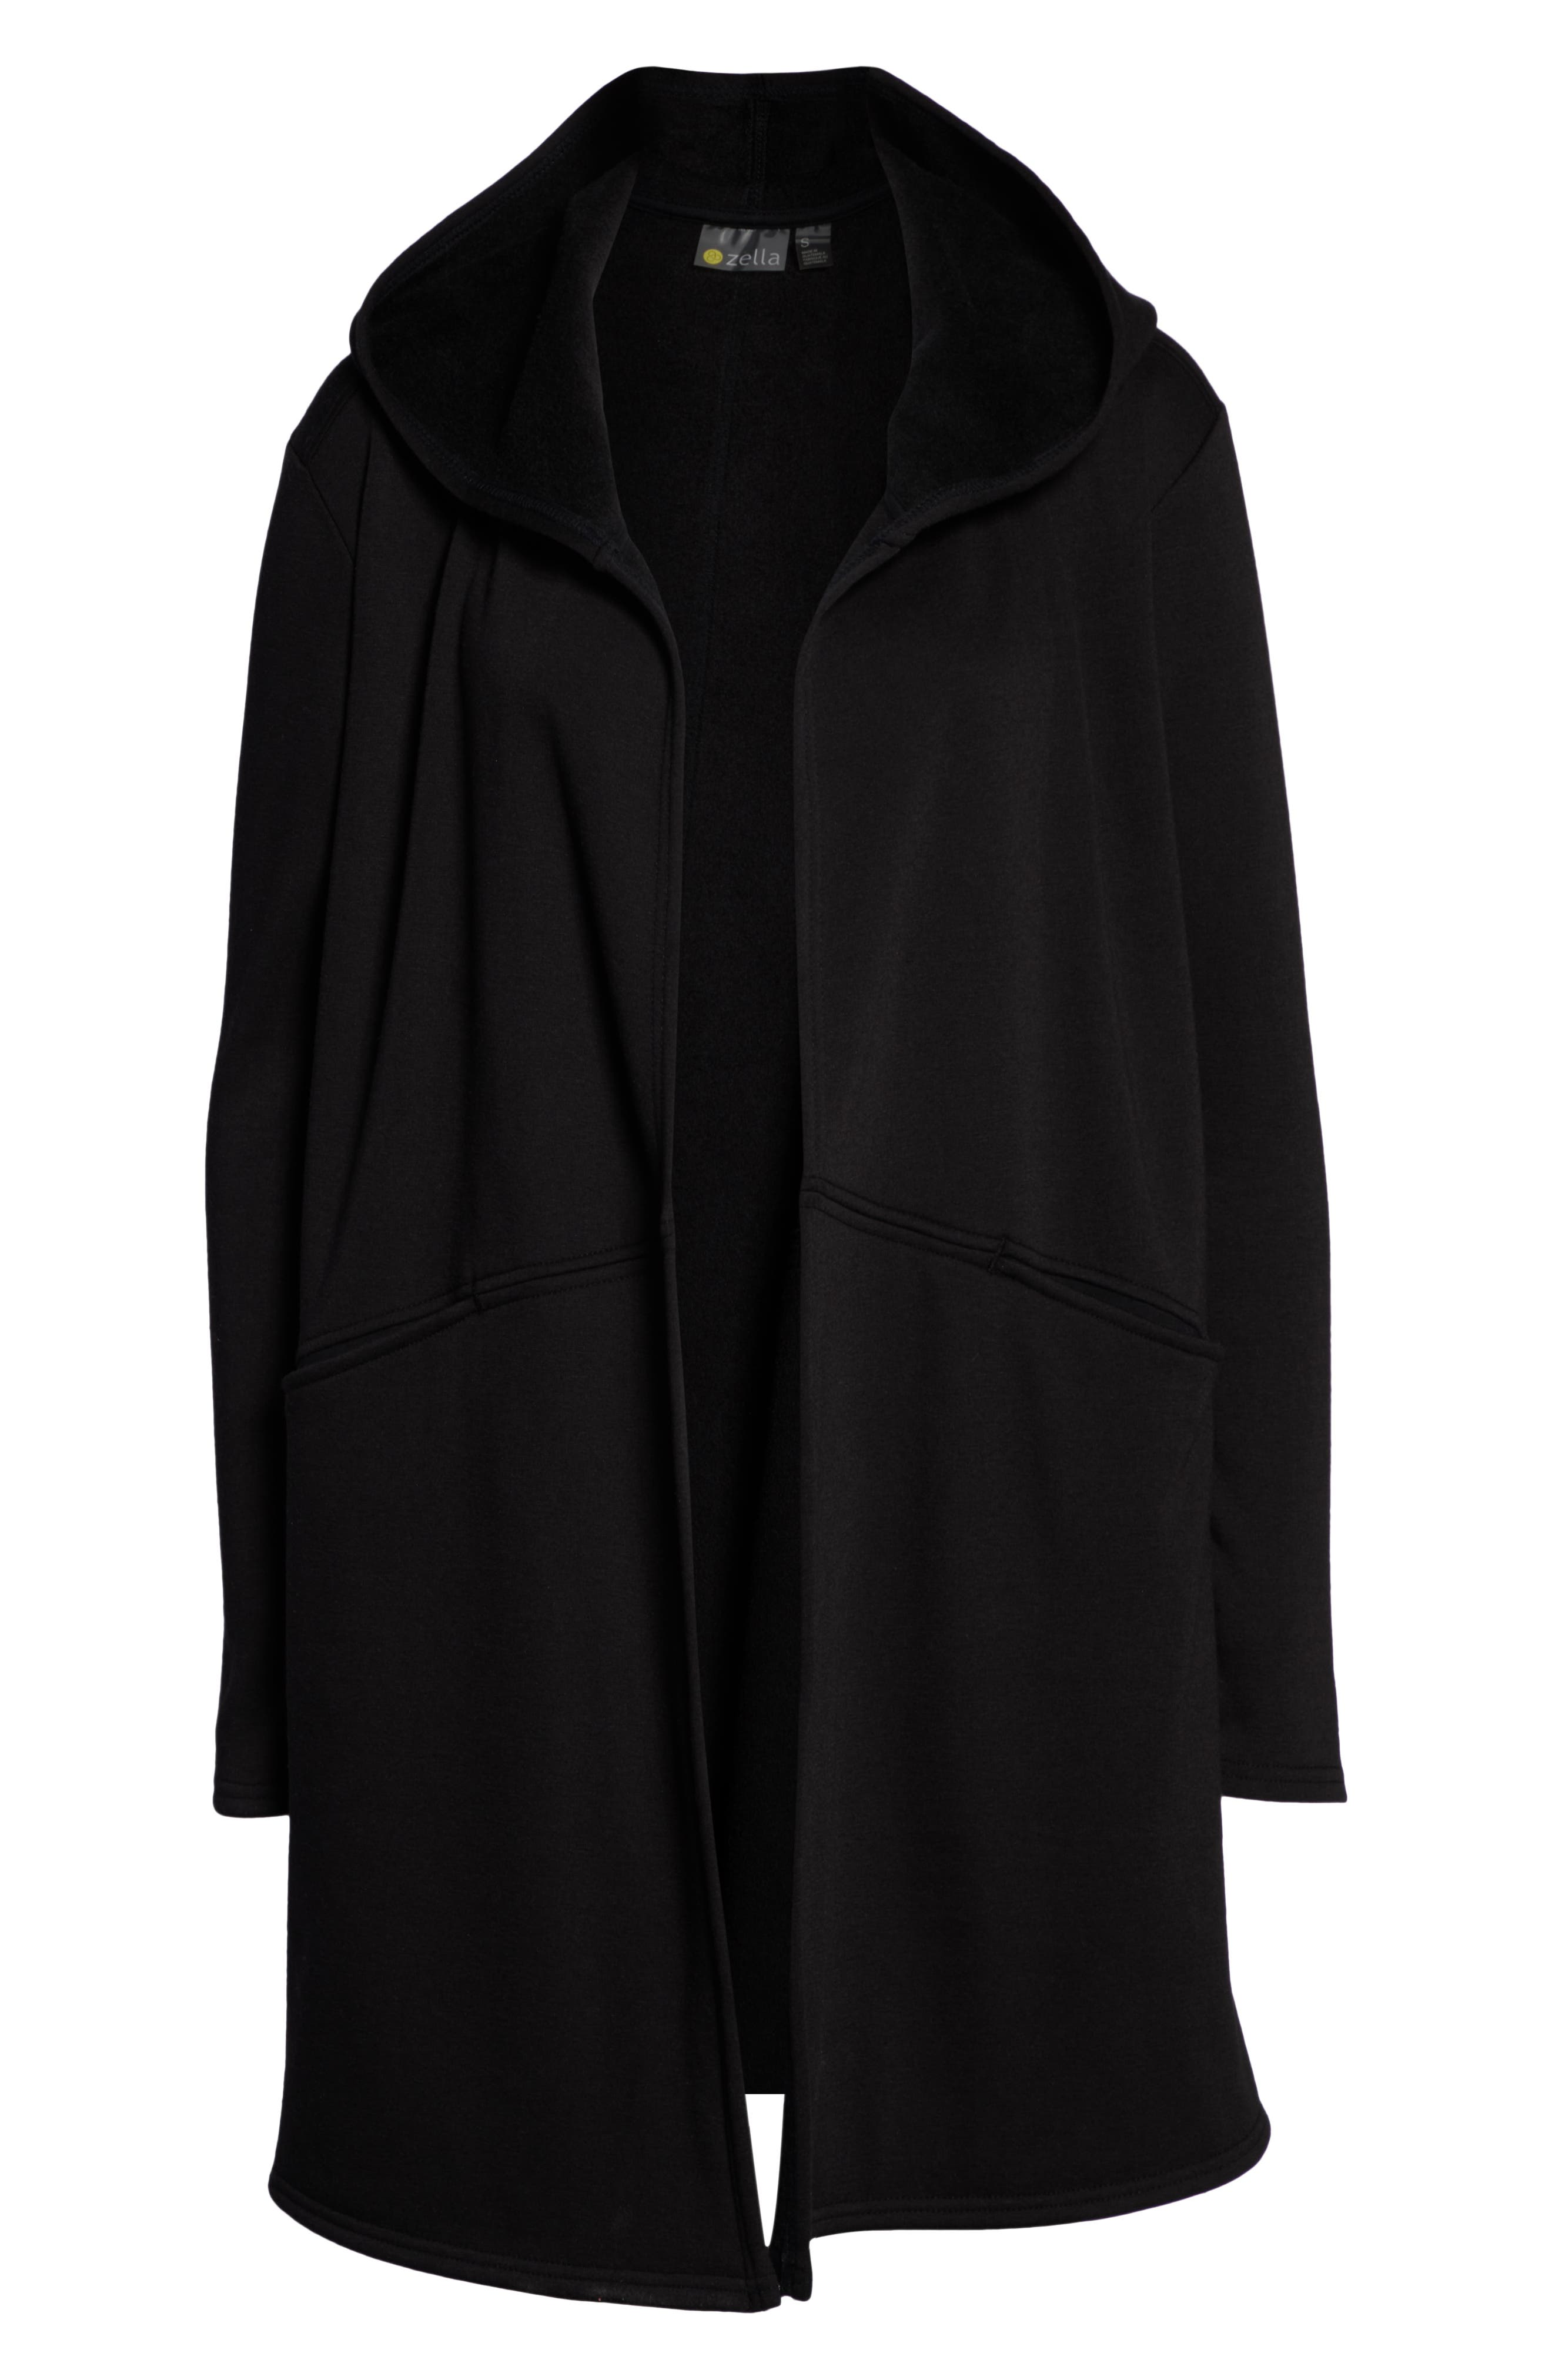 ZELLA,                             Plush Lined Wrap Hooded Jacket,                             Alternate thumbnail 7, color,                             001